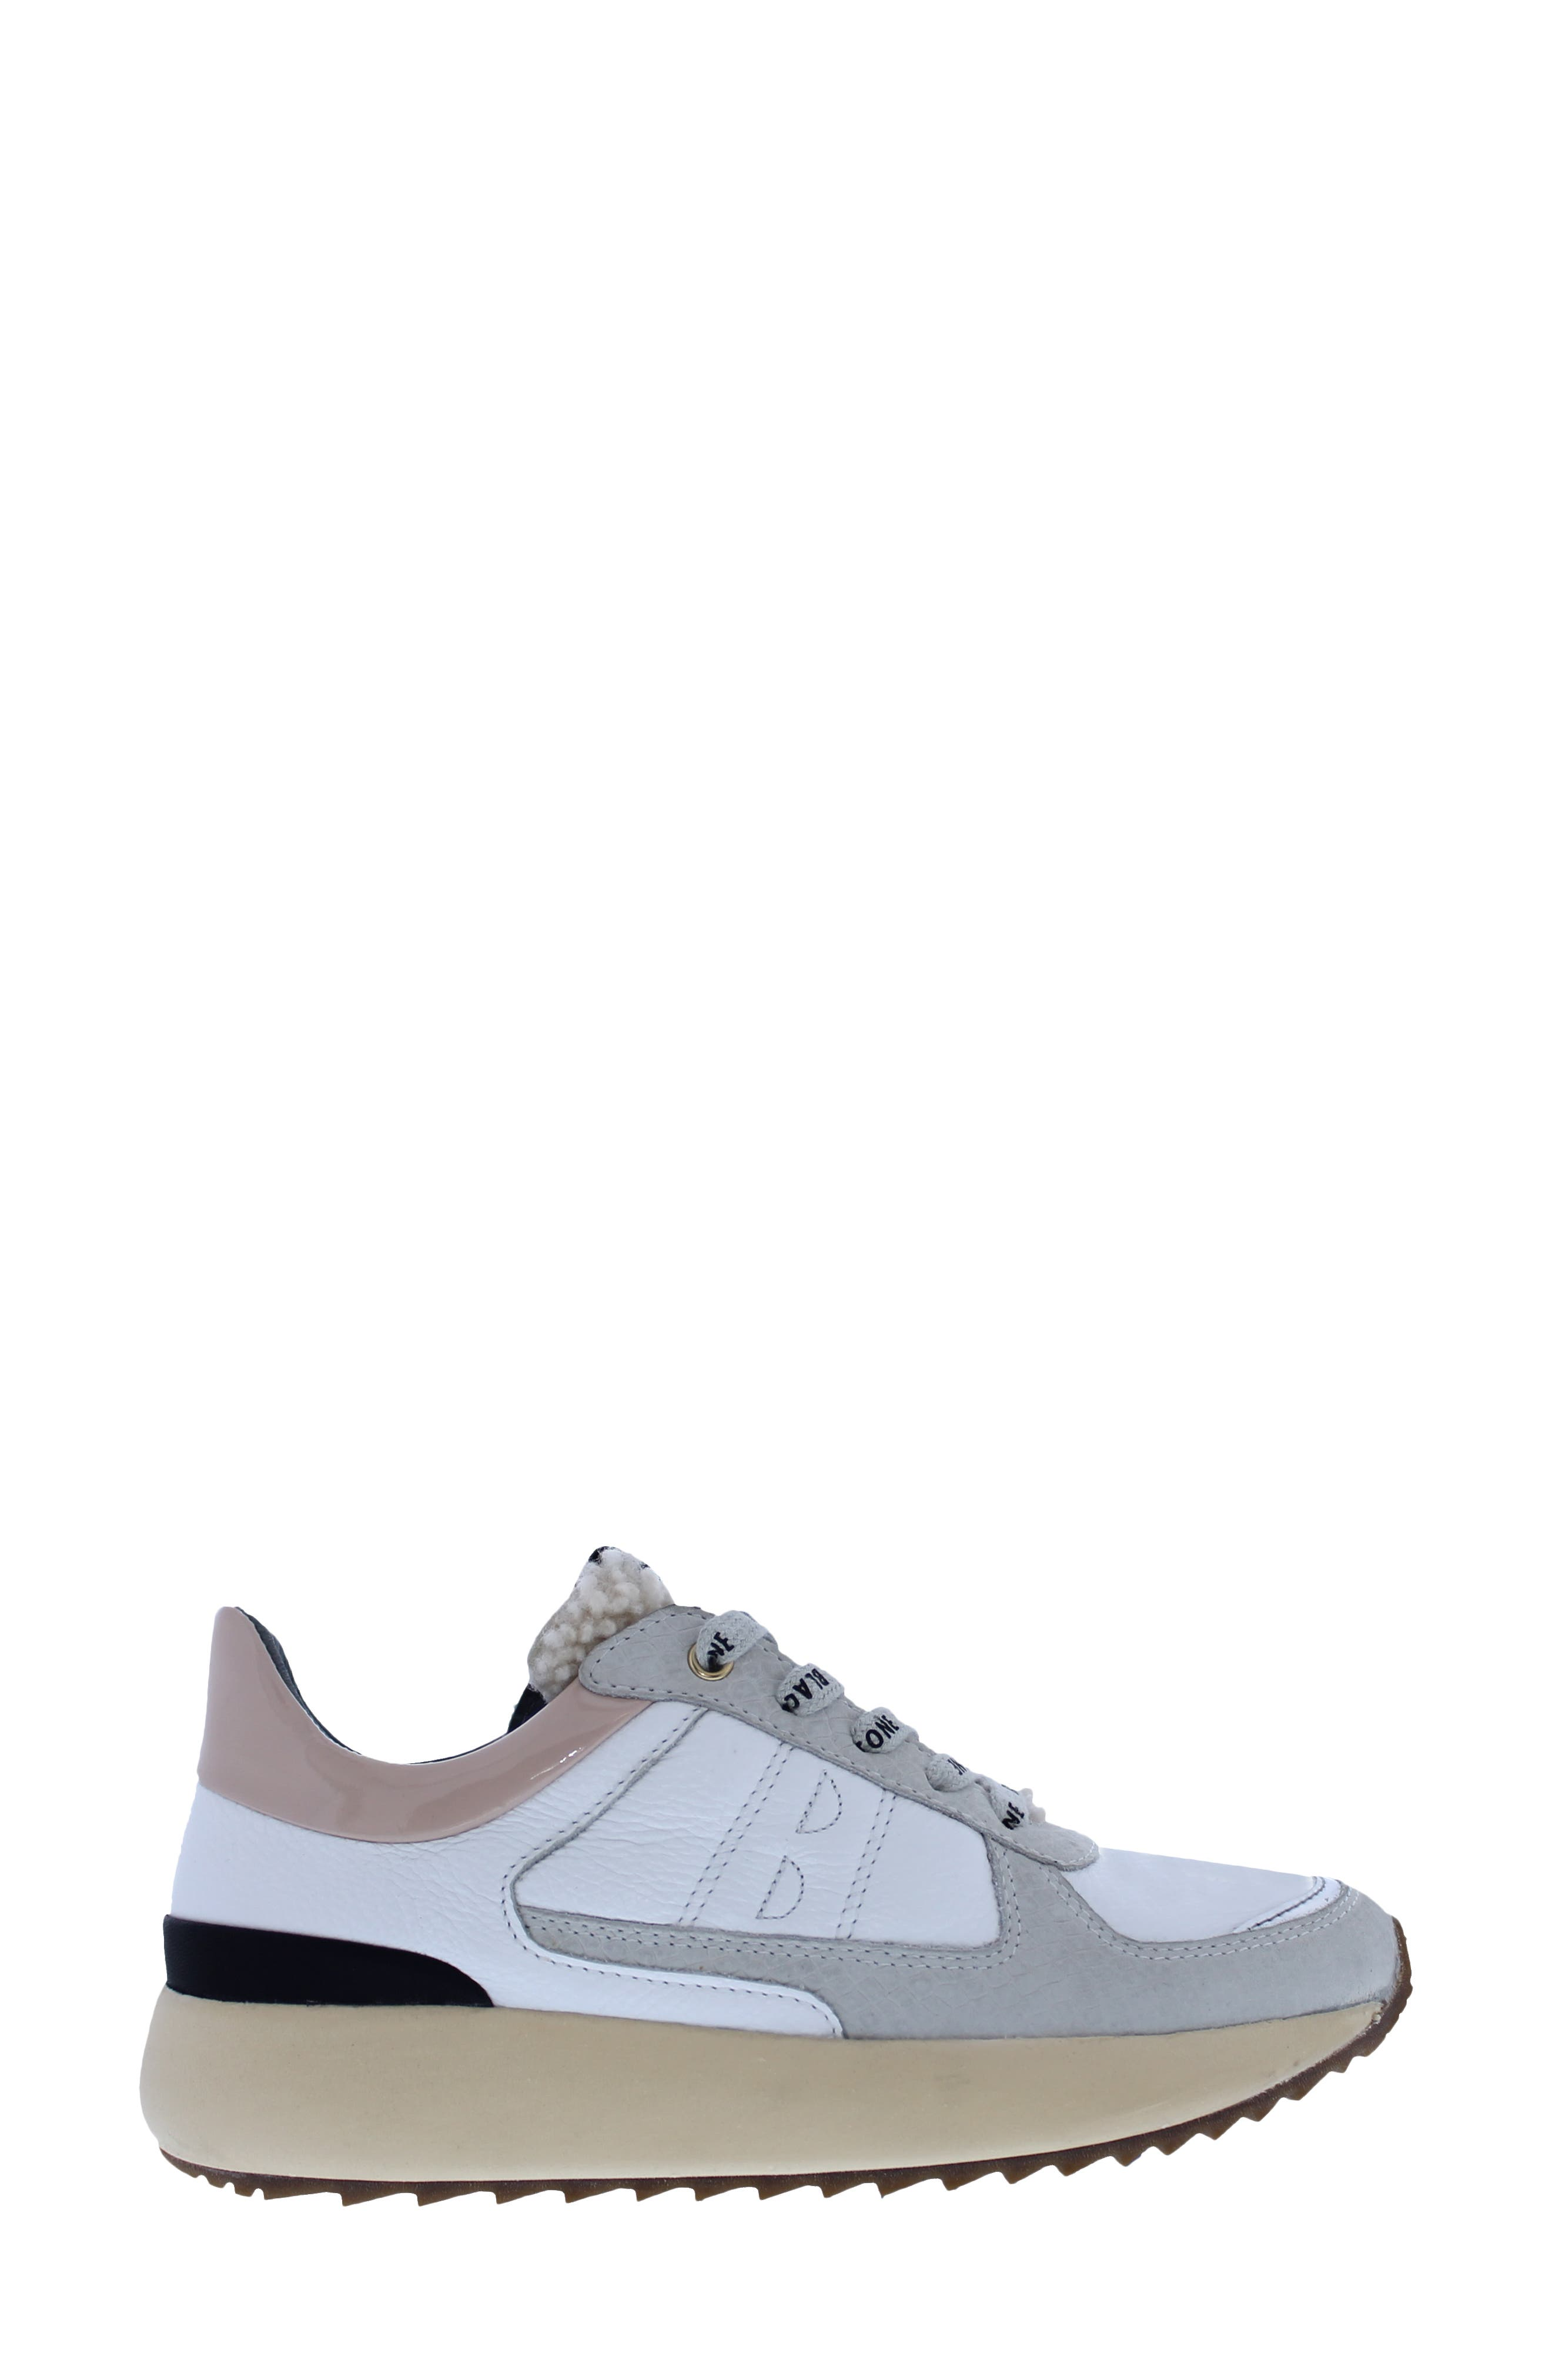 Ul92 Genuine Shearling Lace-Up Sneaker